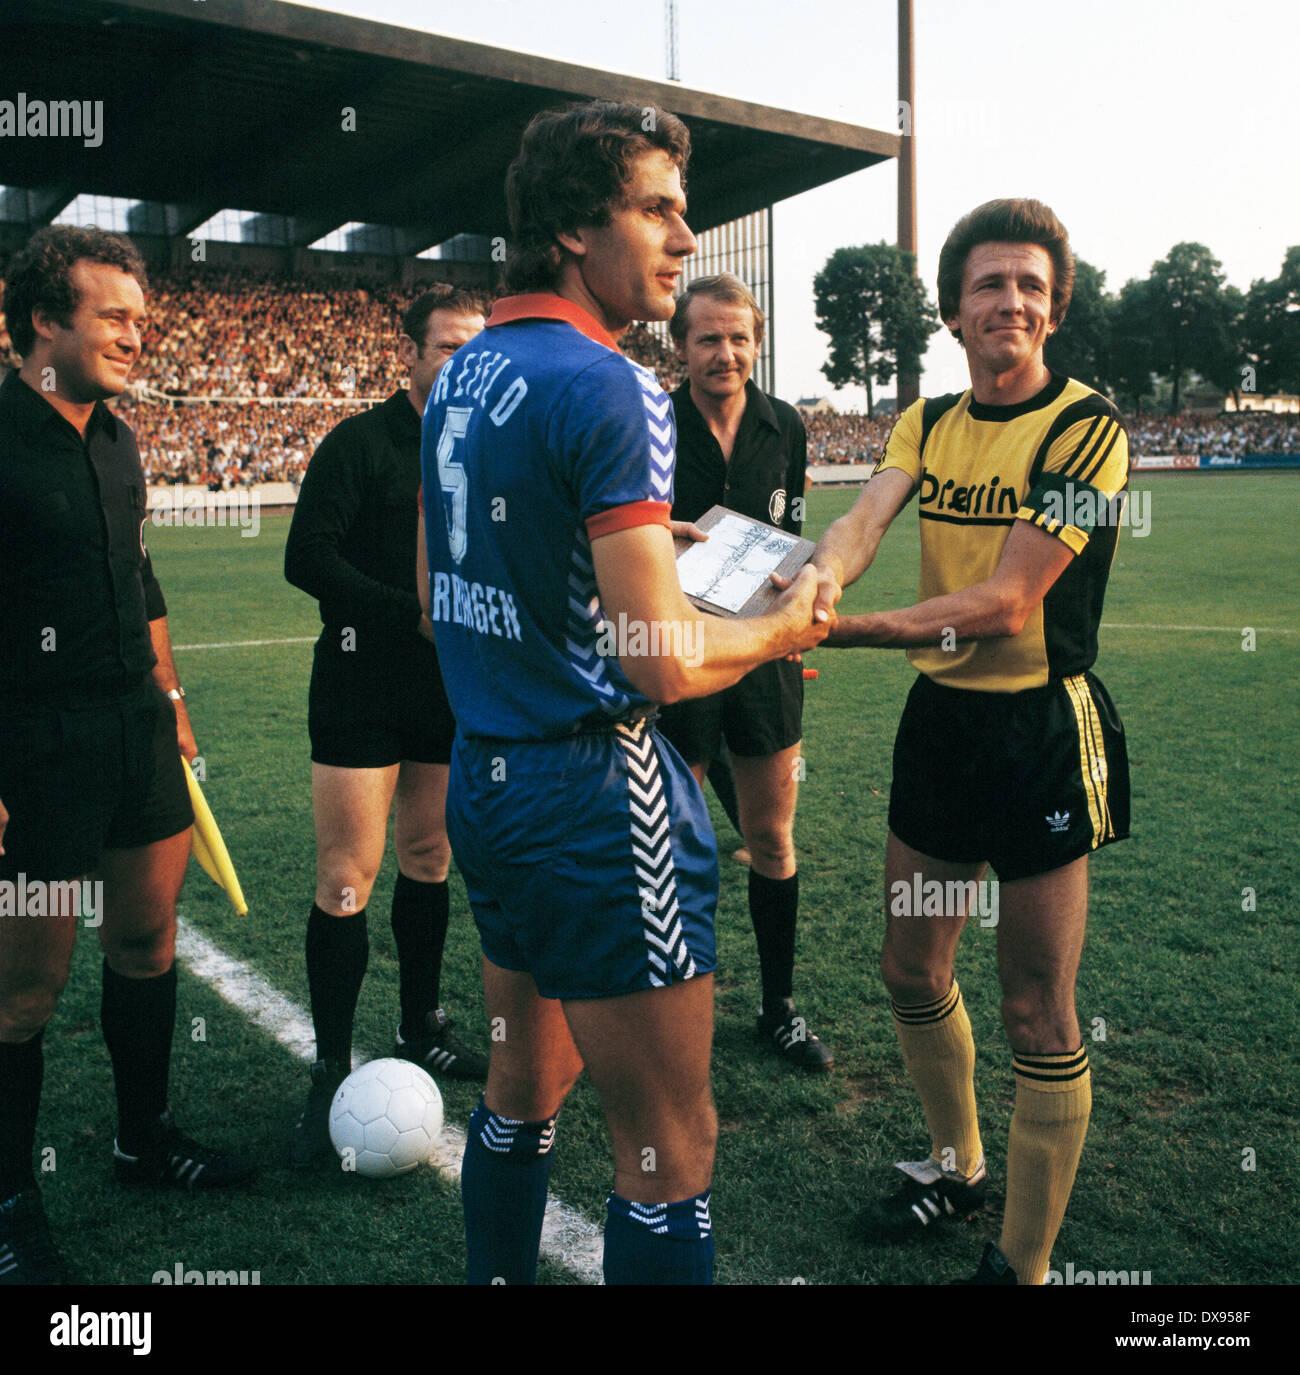 football, 2. Bundesliga Nord, 2. Bundesliga Sued, 1978/1979, relegation match to Bundesliga 1979/1980, return leg, Grotenburg Stadium in Krefeld, FC Bayer 05 Uerdingen versus SpVgg Bayreuth 2:1, welcome, team leaders Paul Hahn (Uerdingen) left and Wolfgan - Stock Image